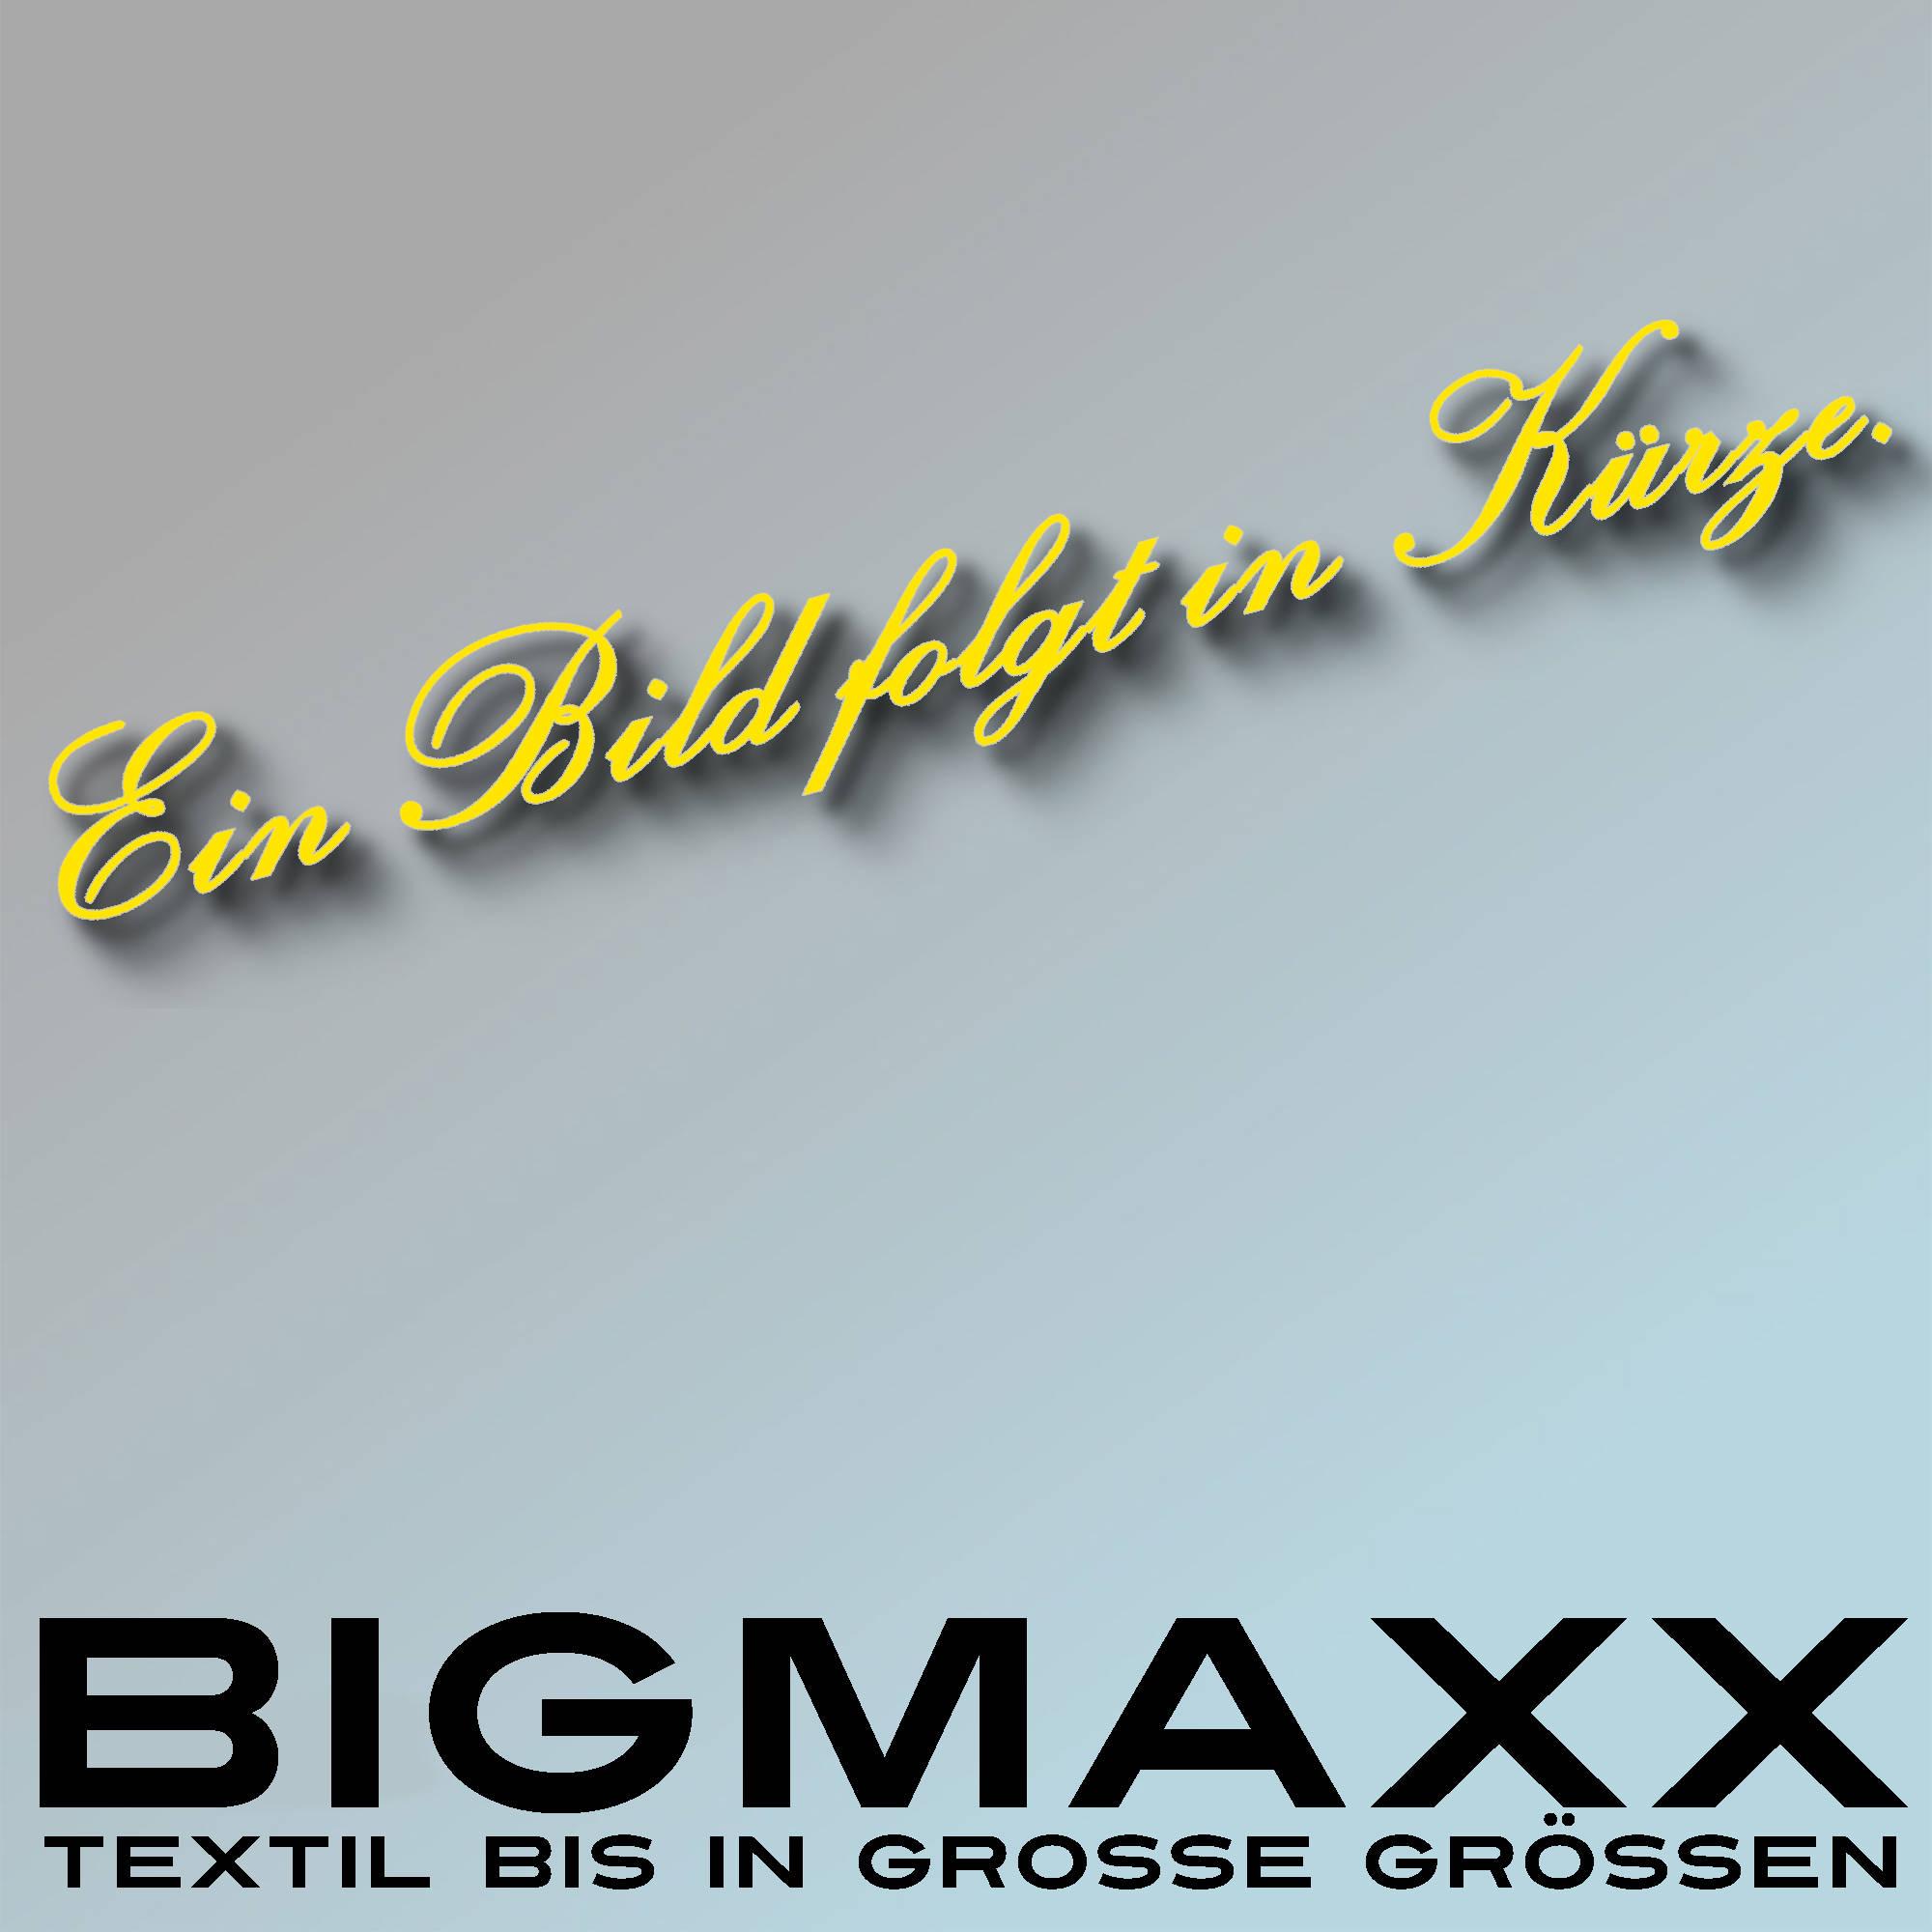 12 Stück reinweiße Damen Taschentücher Satin Kanten Stofftaschentücher Schnupftücher Nastücher